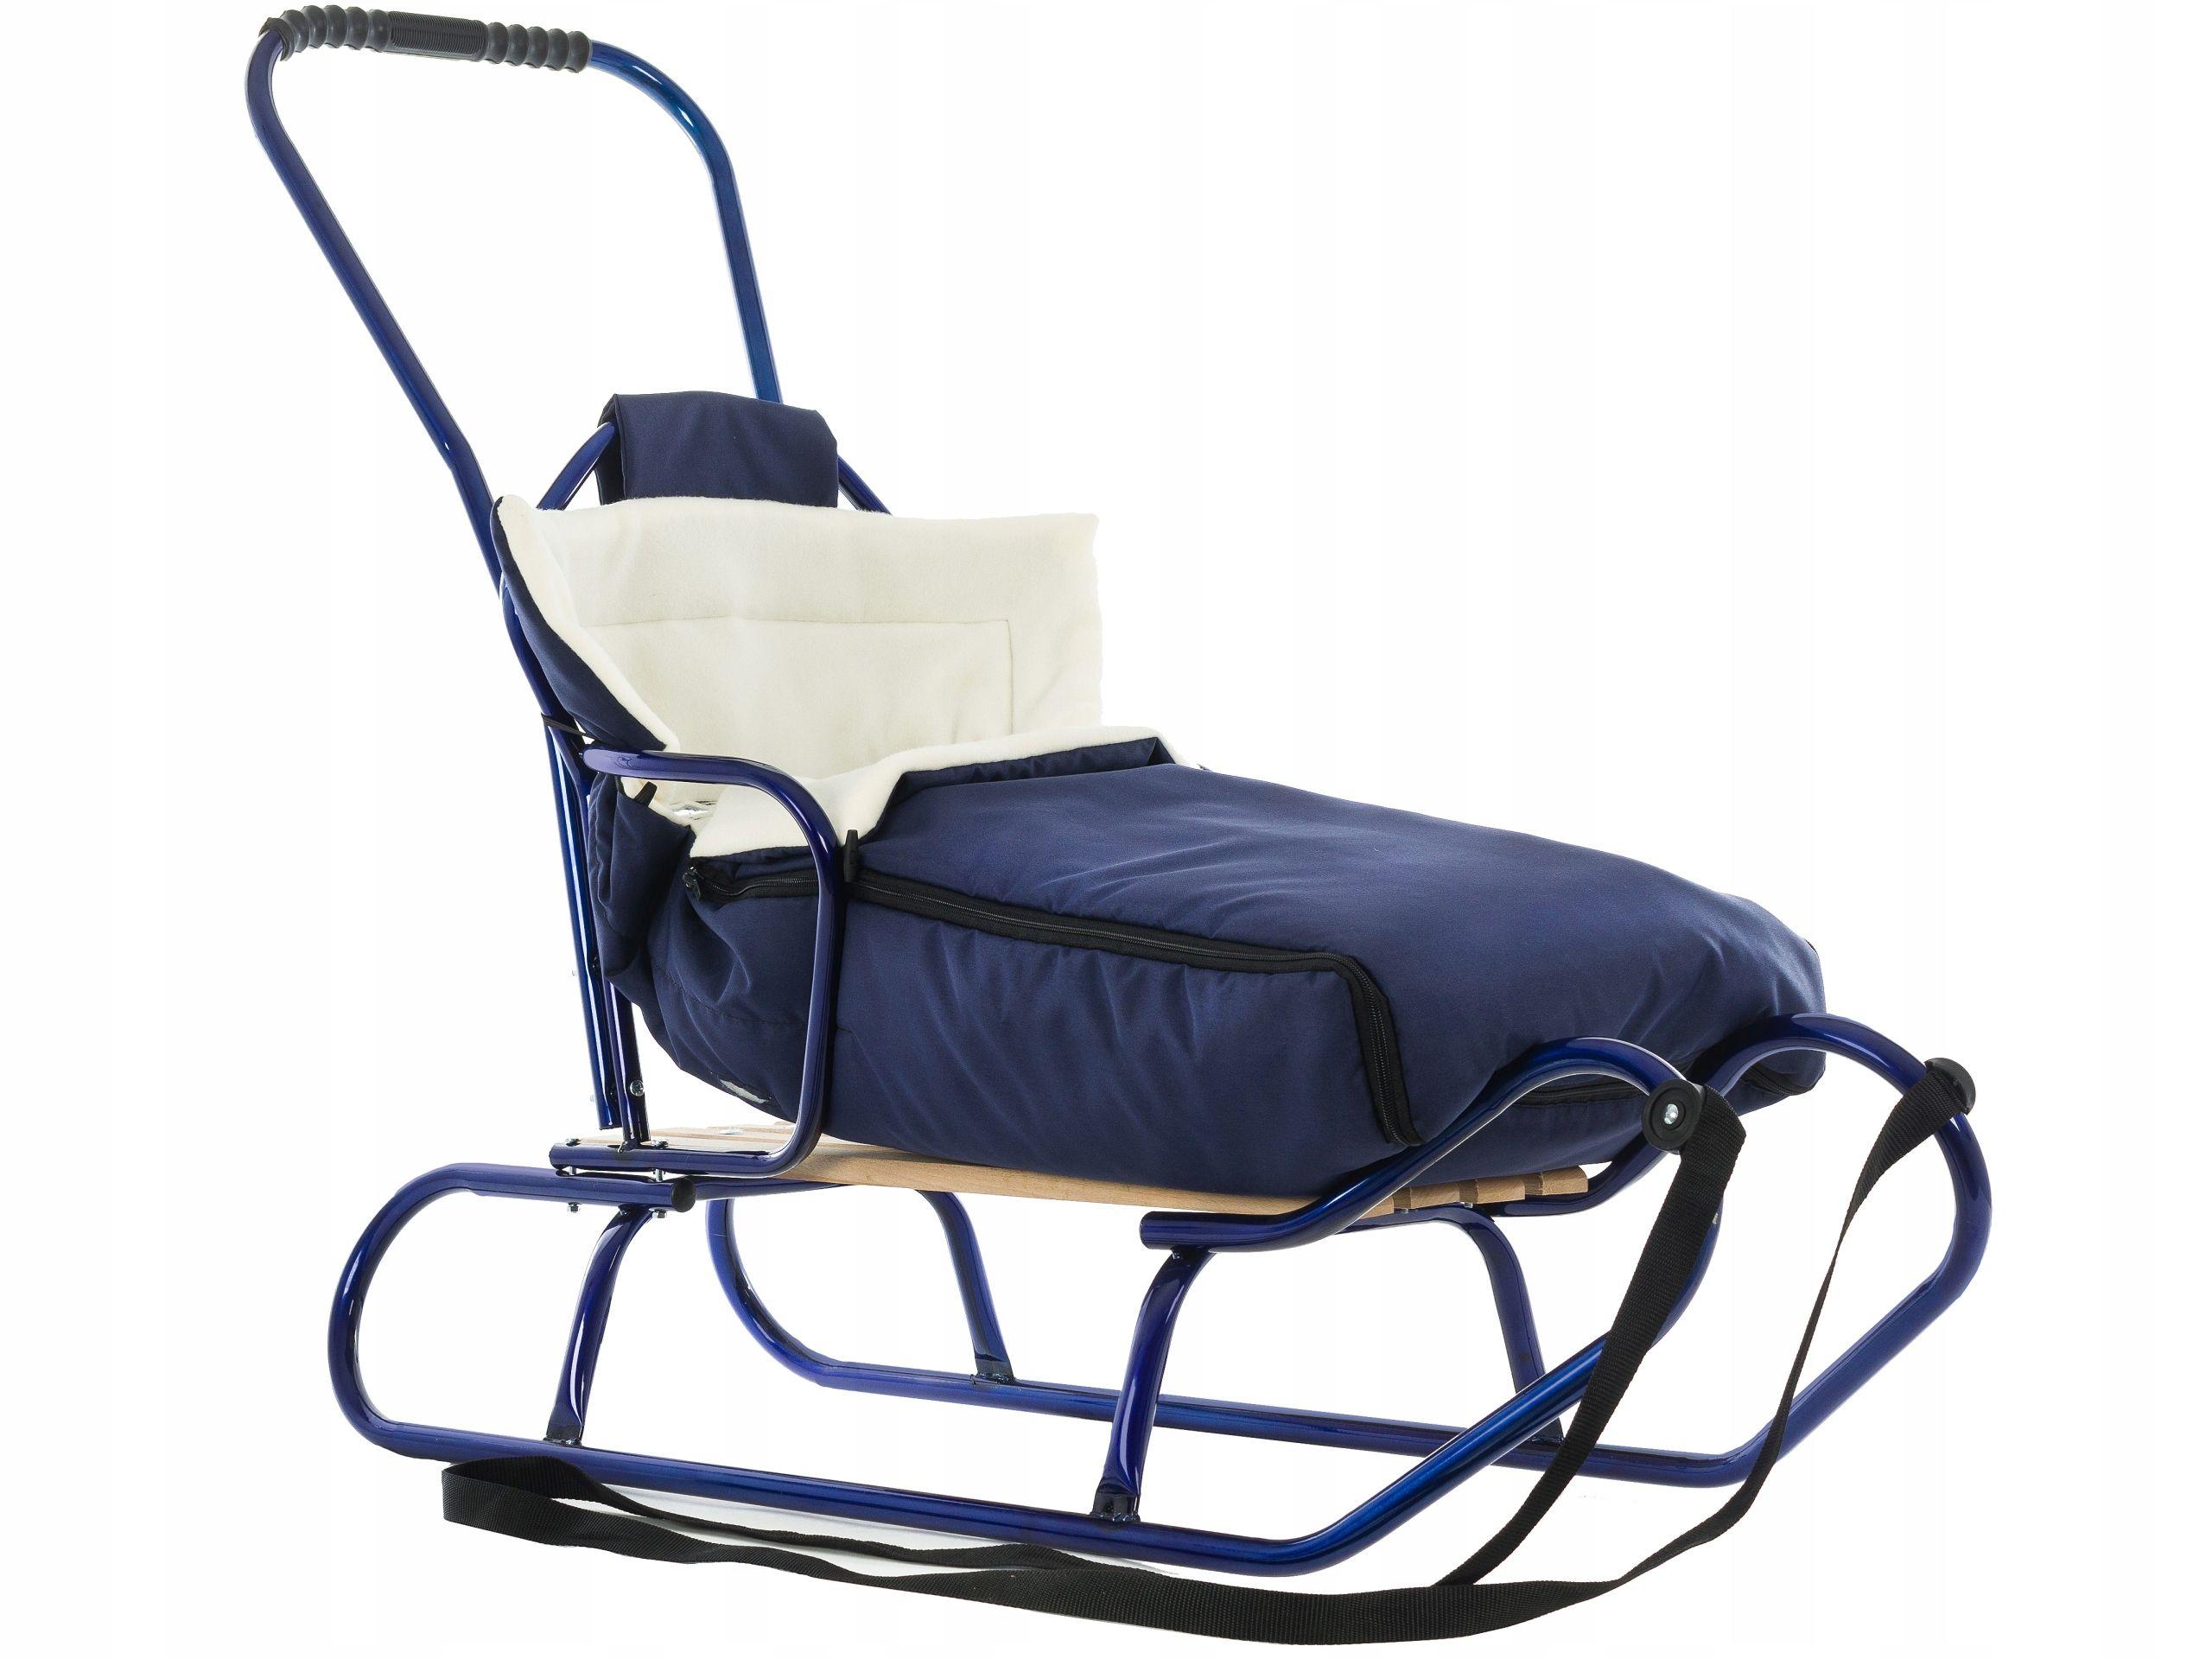 Kup Teraz Na Allegro Pl Za 129 Zl Polskie Sanki Colorline Spiwor Pchacz Oparcie 7570388610 Allegro Pl Radosc Zakup Baby Strollers Stroller Children